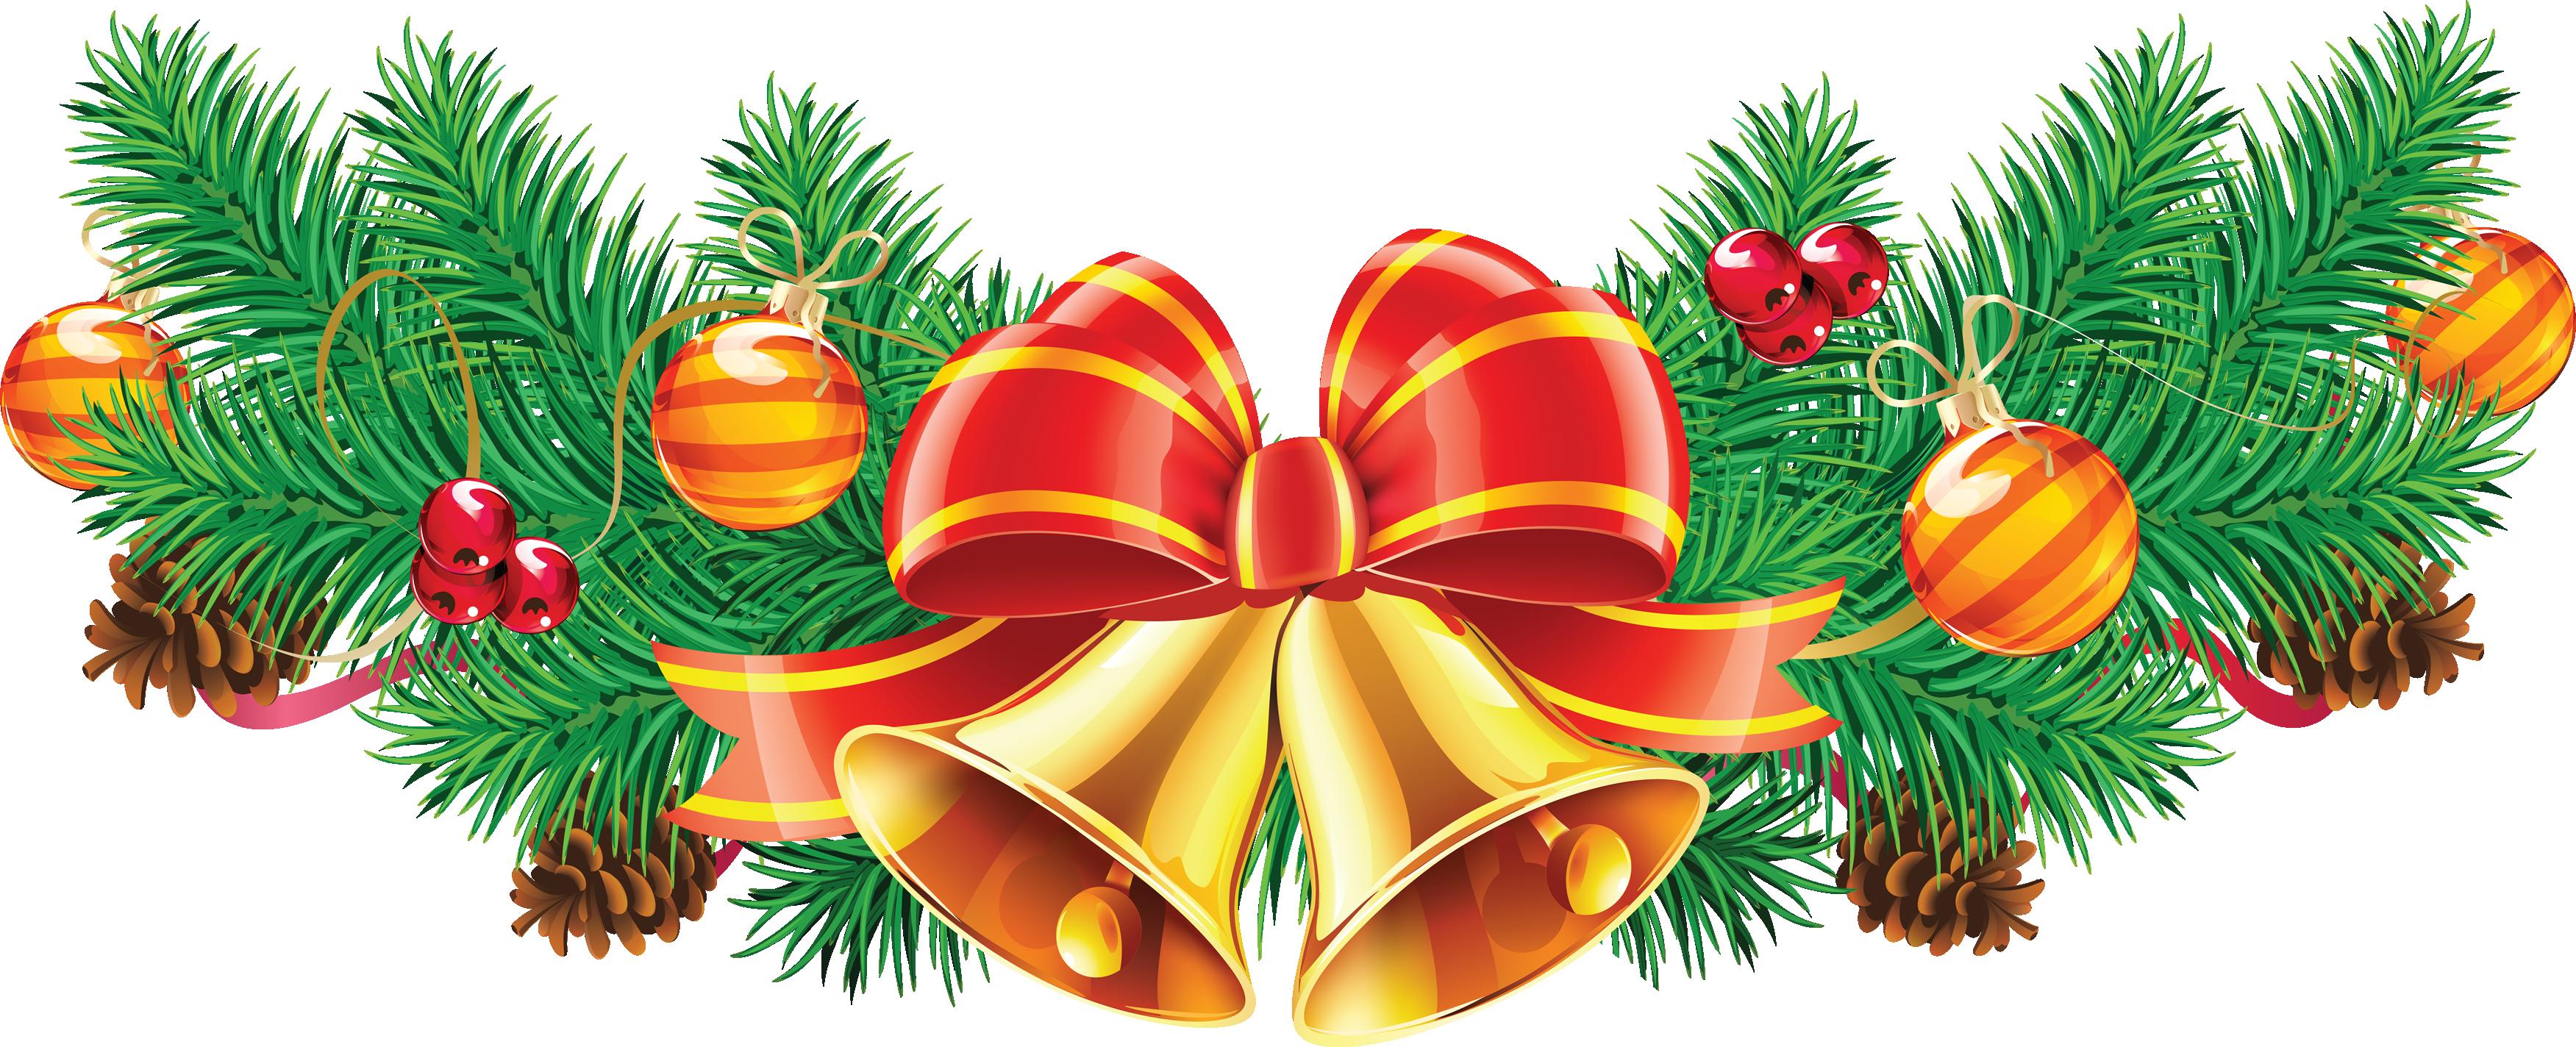 Christmas Ribbon Transparent